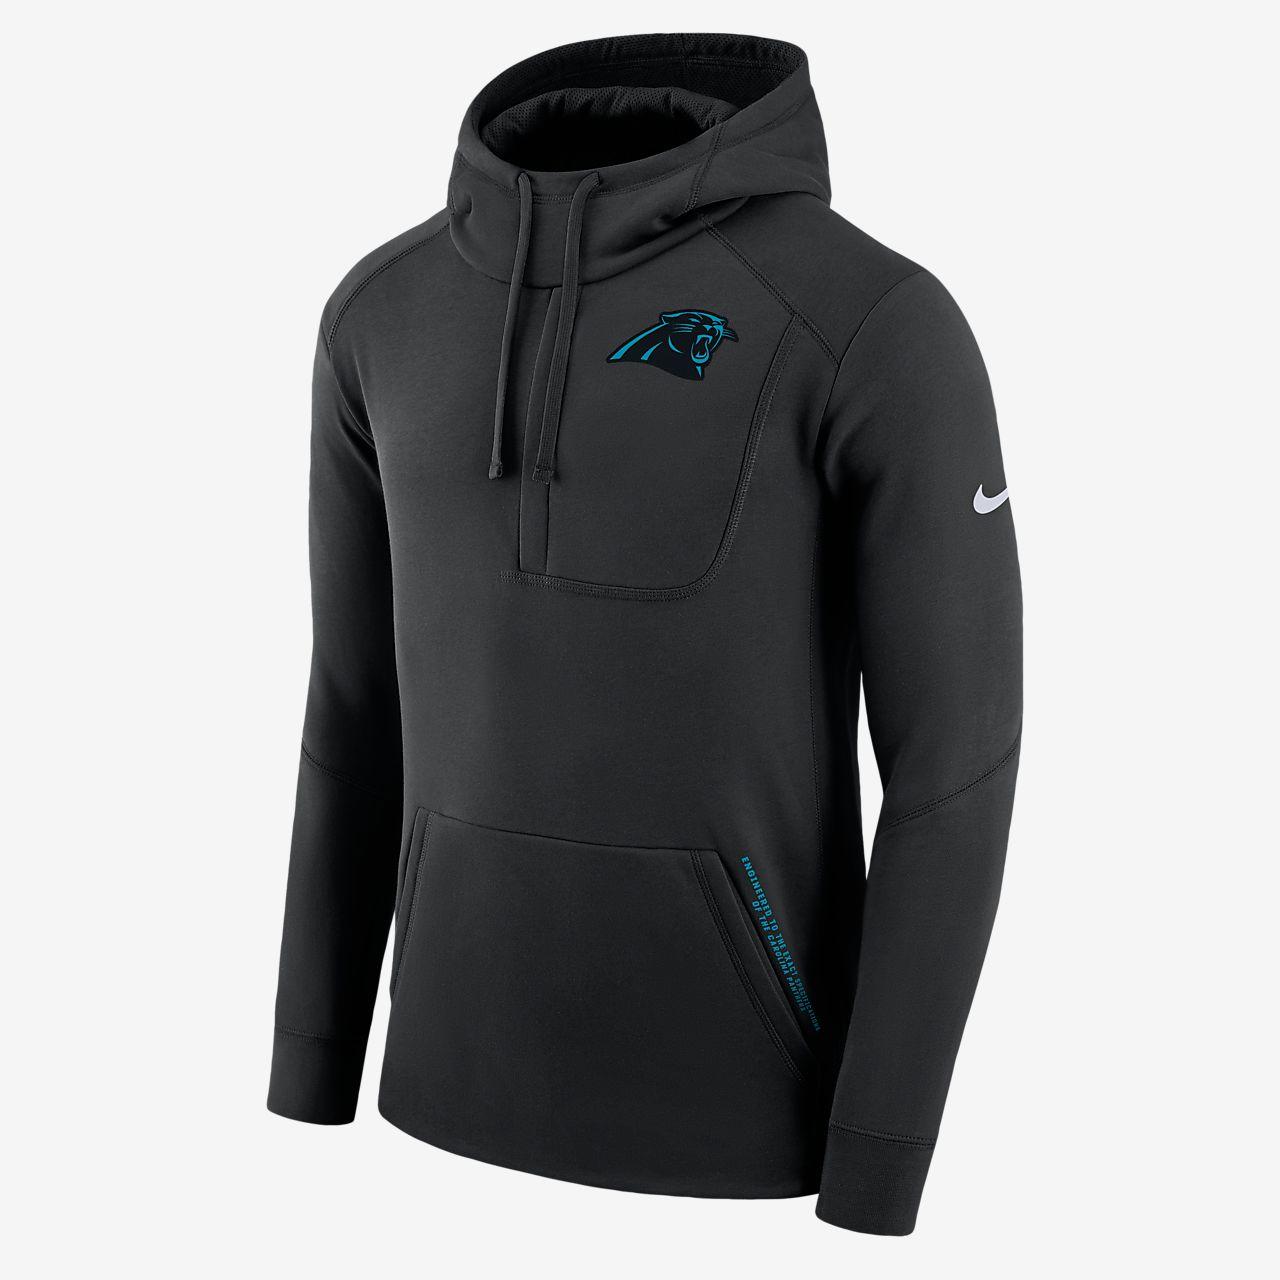 Nike Fly Fleece (NFL Panthers) Men's Sweatshirt Hoodie